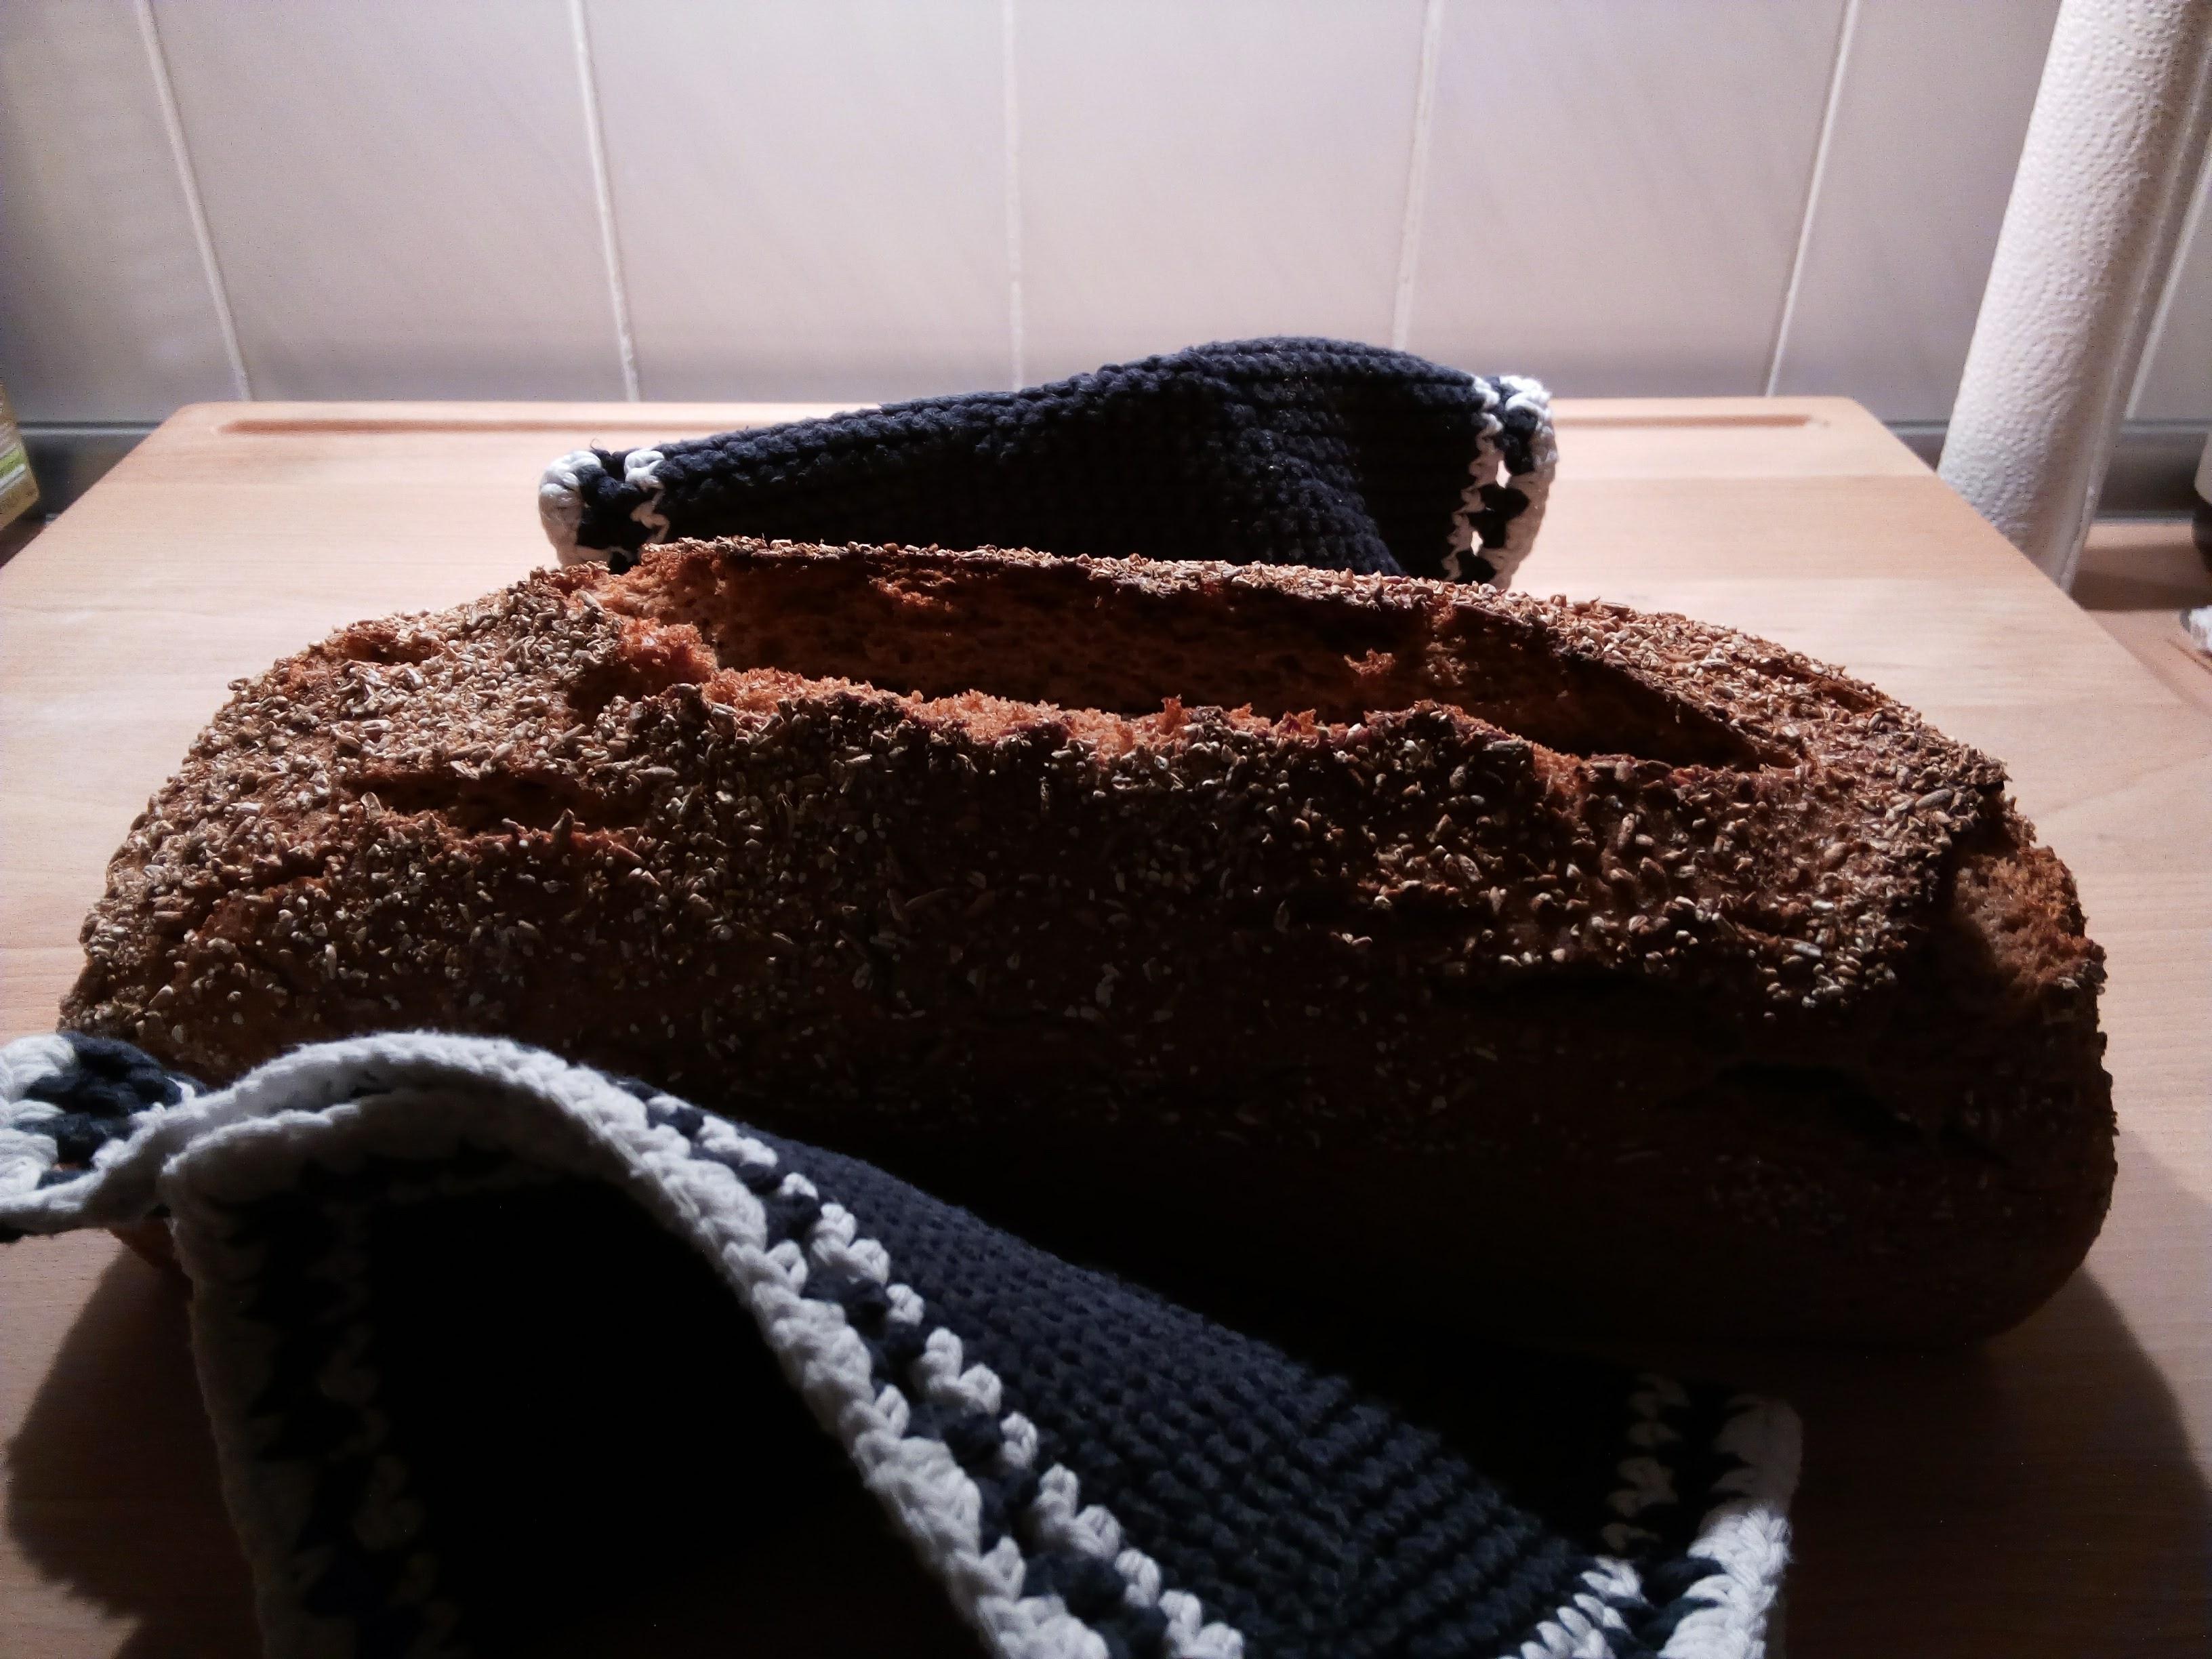 kosmokowski: Selbst gebackenes Brot aus Sauerteig